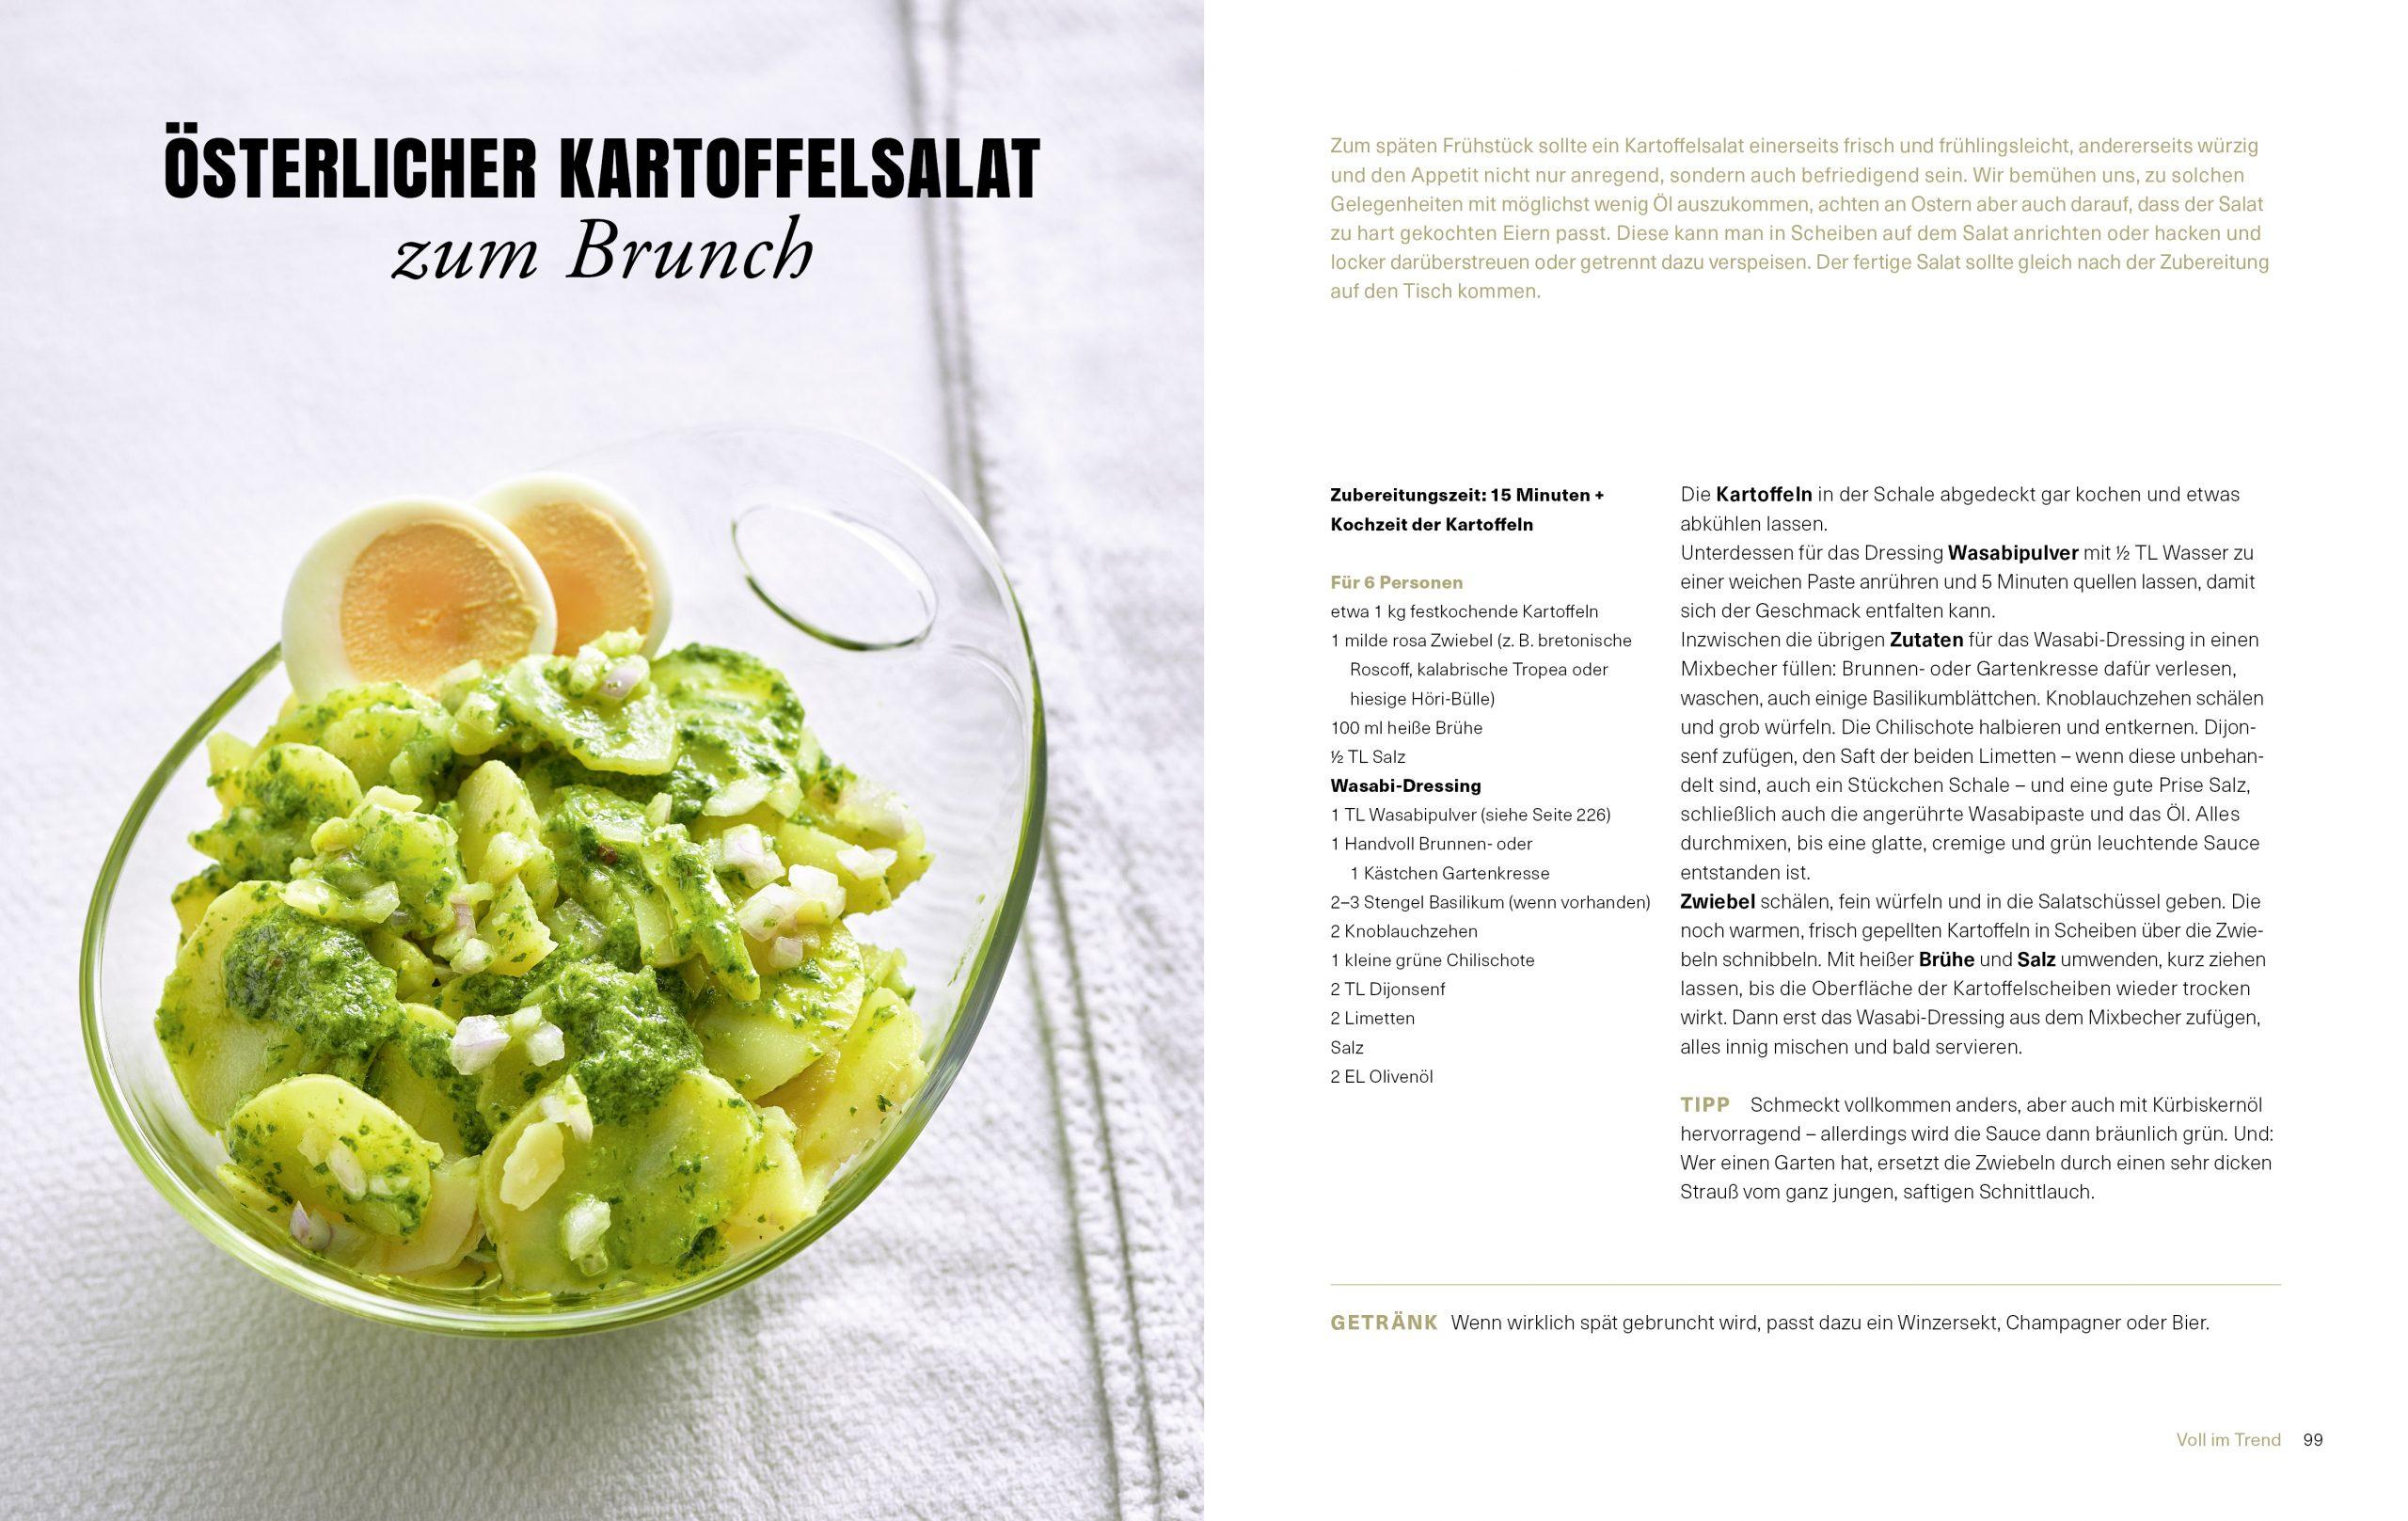 Martina Und Moritz Kartoffelsalat Rezept Pdf